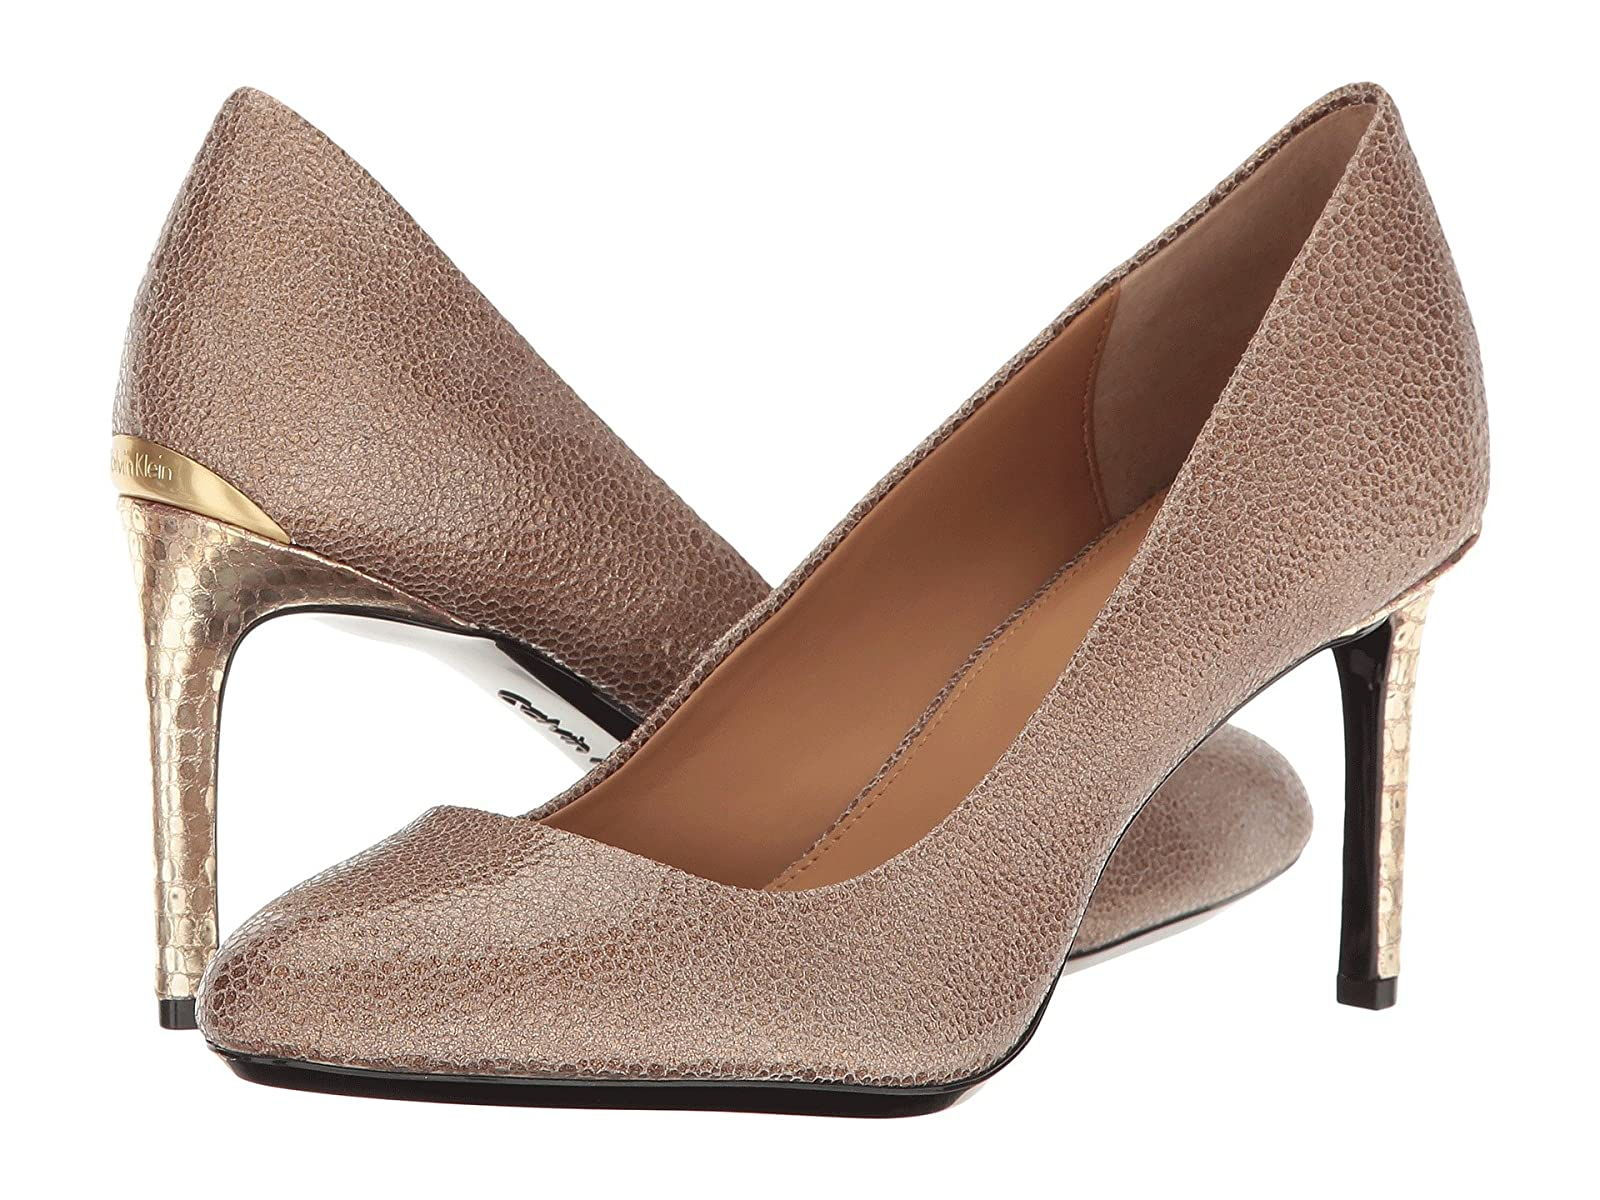 Calvin Klein SalshaCheap and distinctive eye-catching shoes